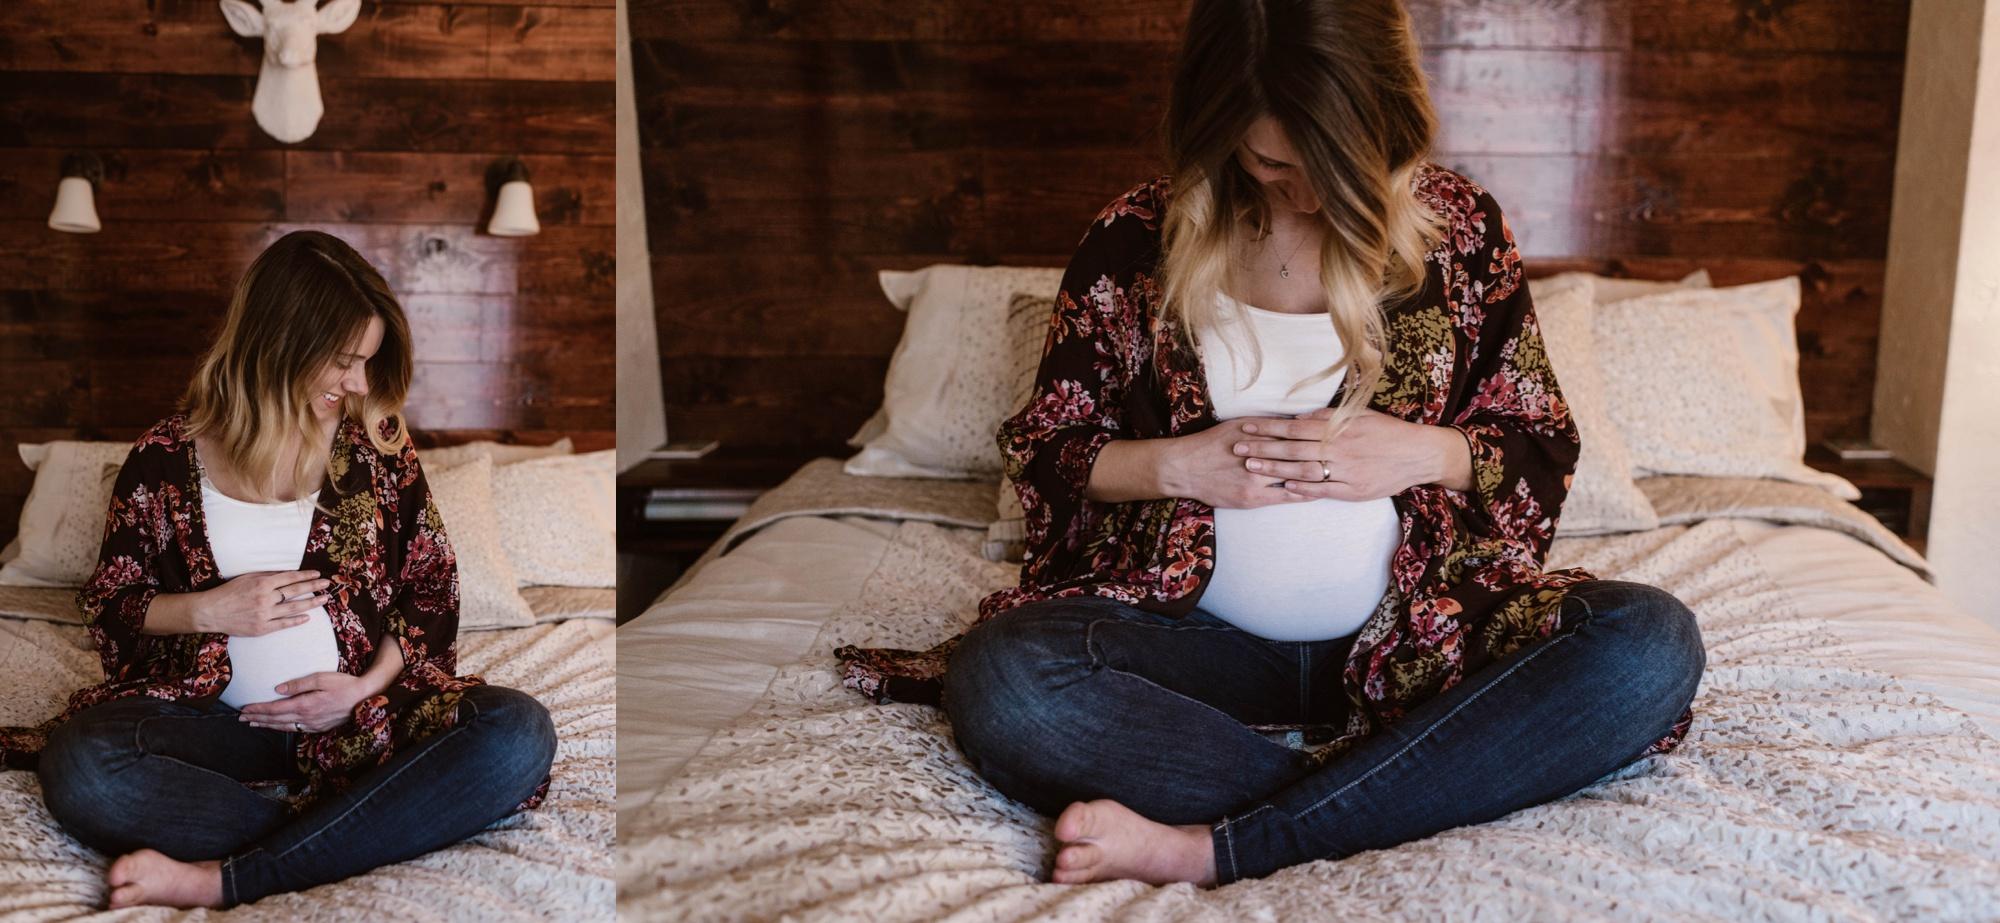 maternity-danielle-b-lauren-grayson-cleveland-akron-canton-ohio-photographer-family-maternity-photography-session-photos-_0020.jpg